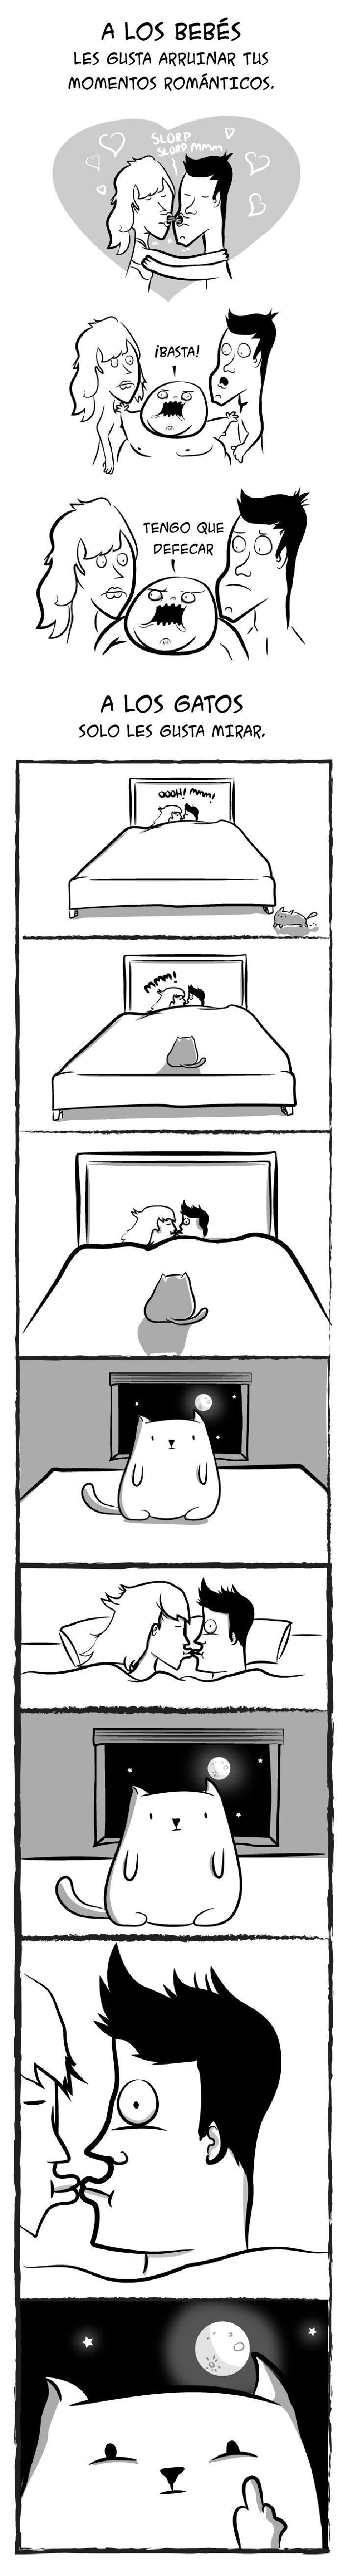 bebes-vs-gatos-05